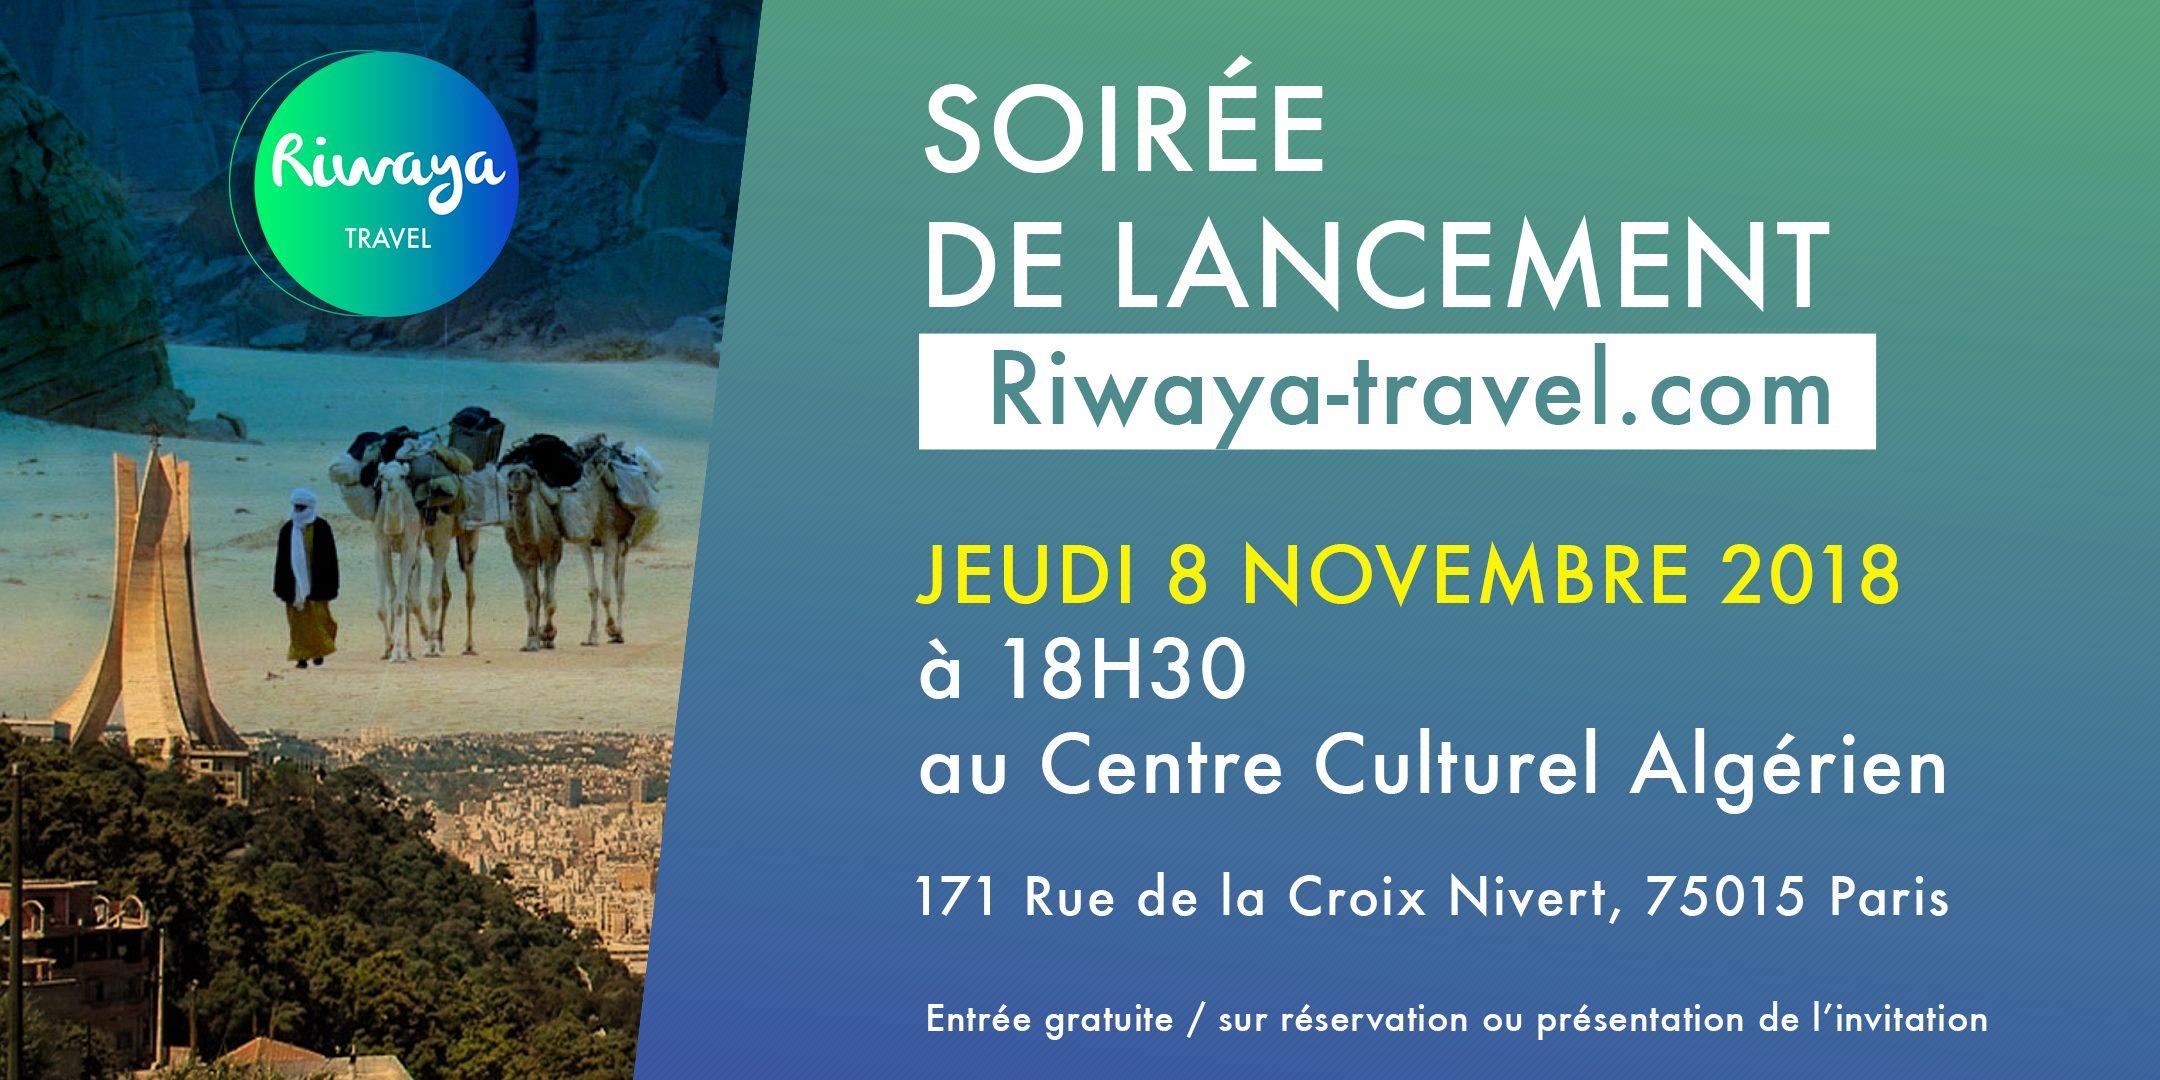 Soirée de lancement Riwaya Travel